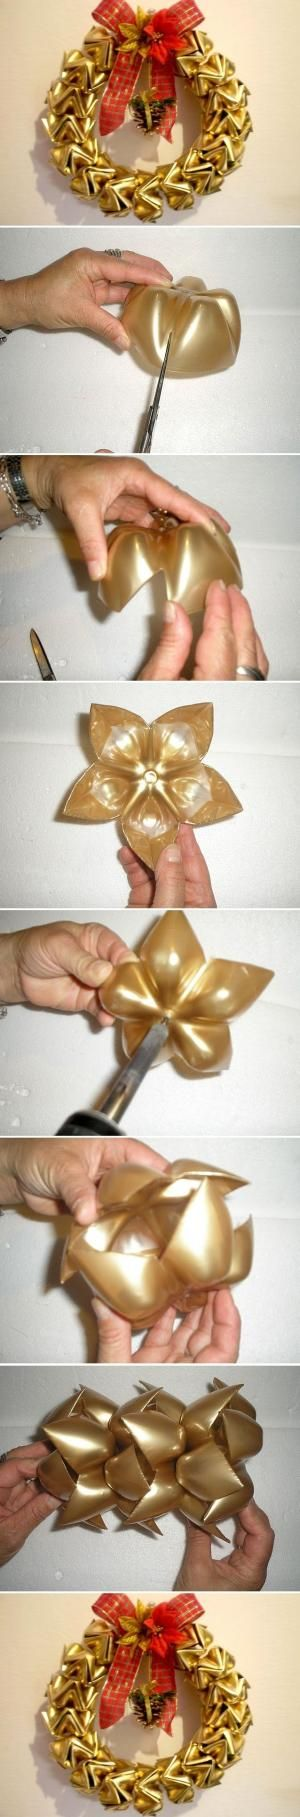 Reciclando también se decora y se celebra! Beautiful Christmas Garland out of PET Bottles by Ana Oliva